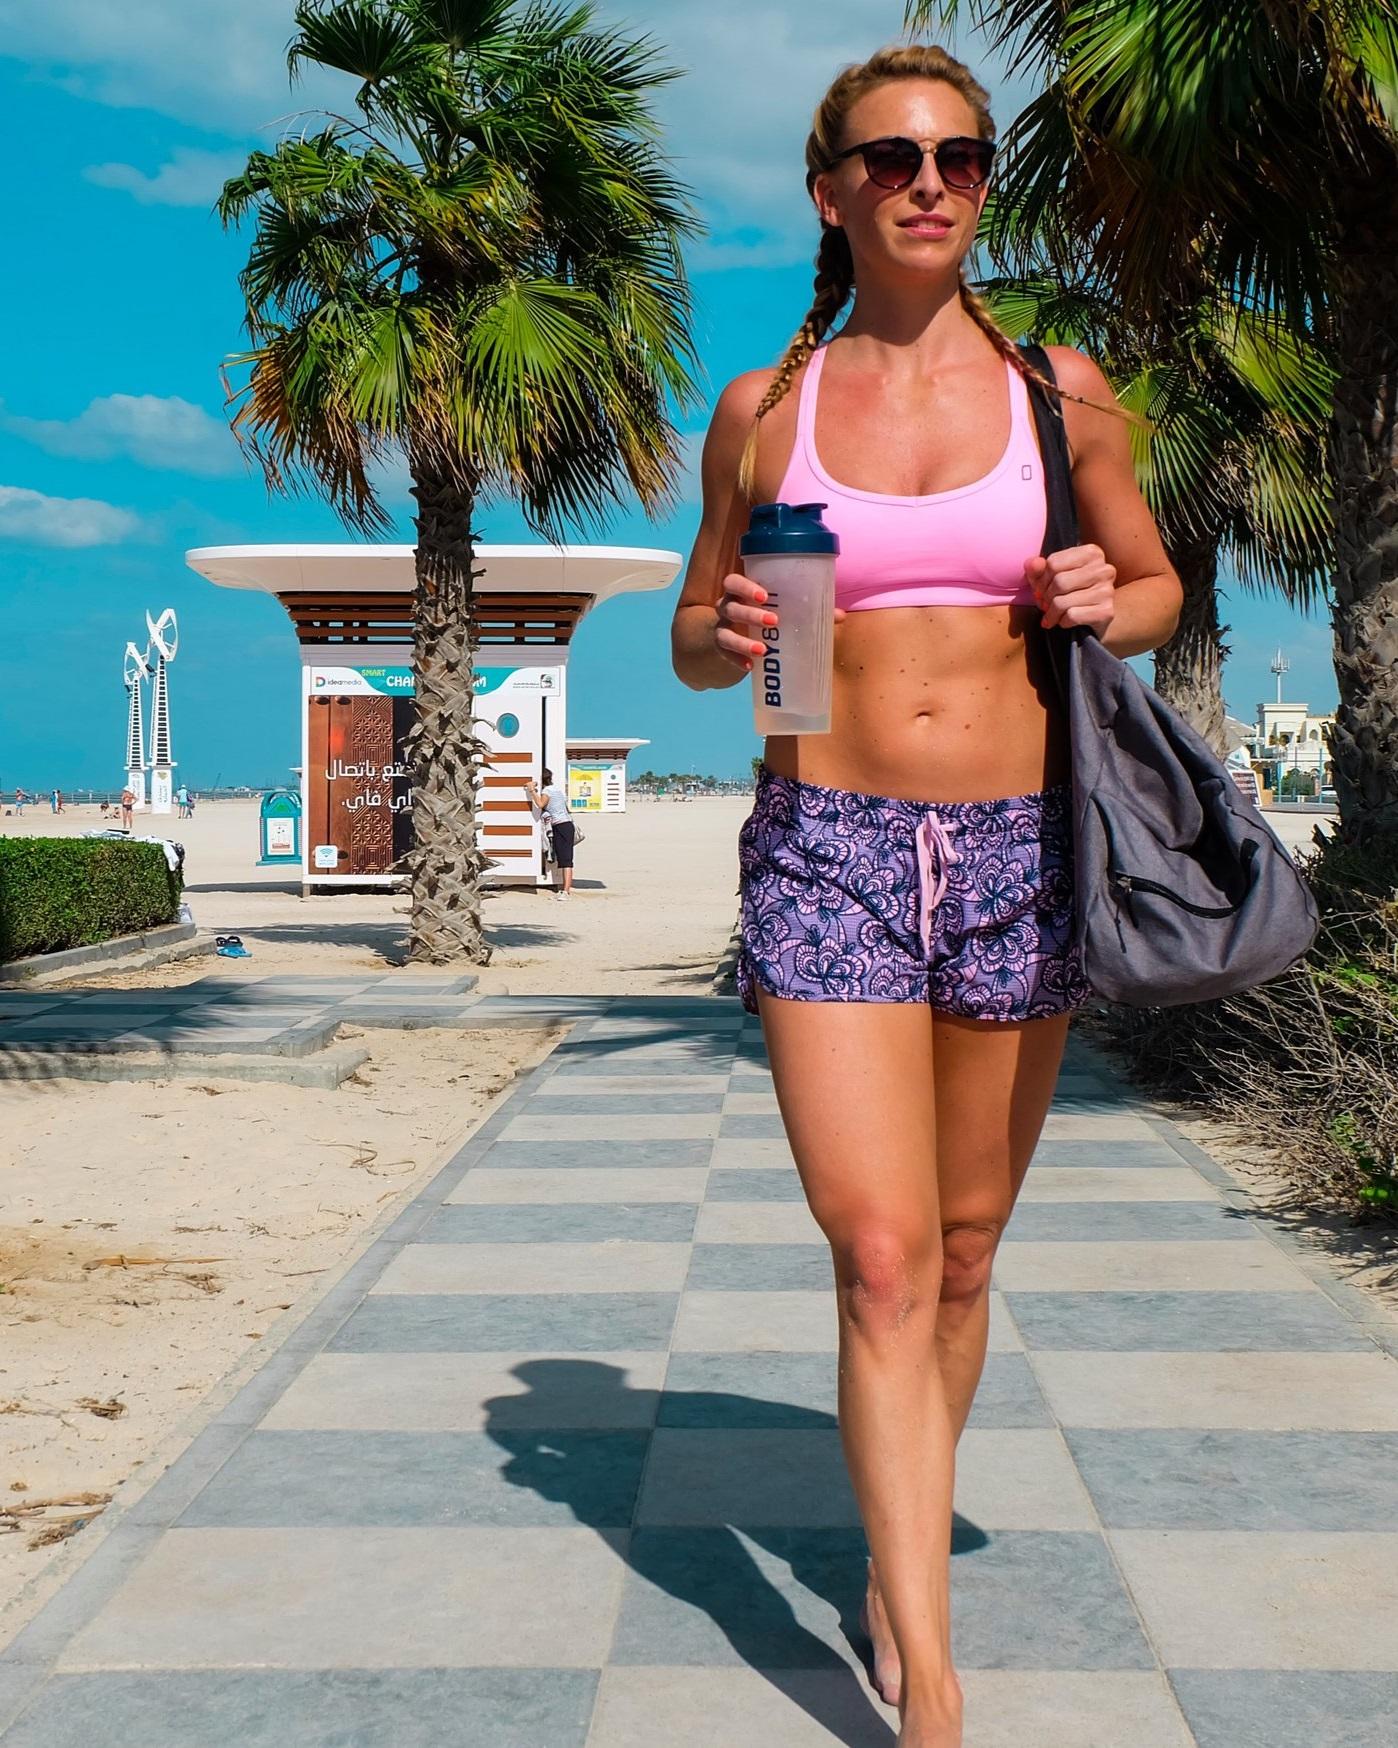 beach-fitness-fun-1223349.jpg